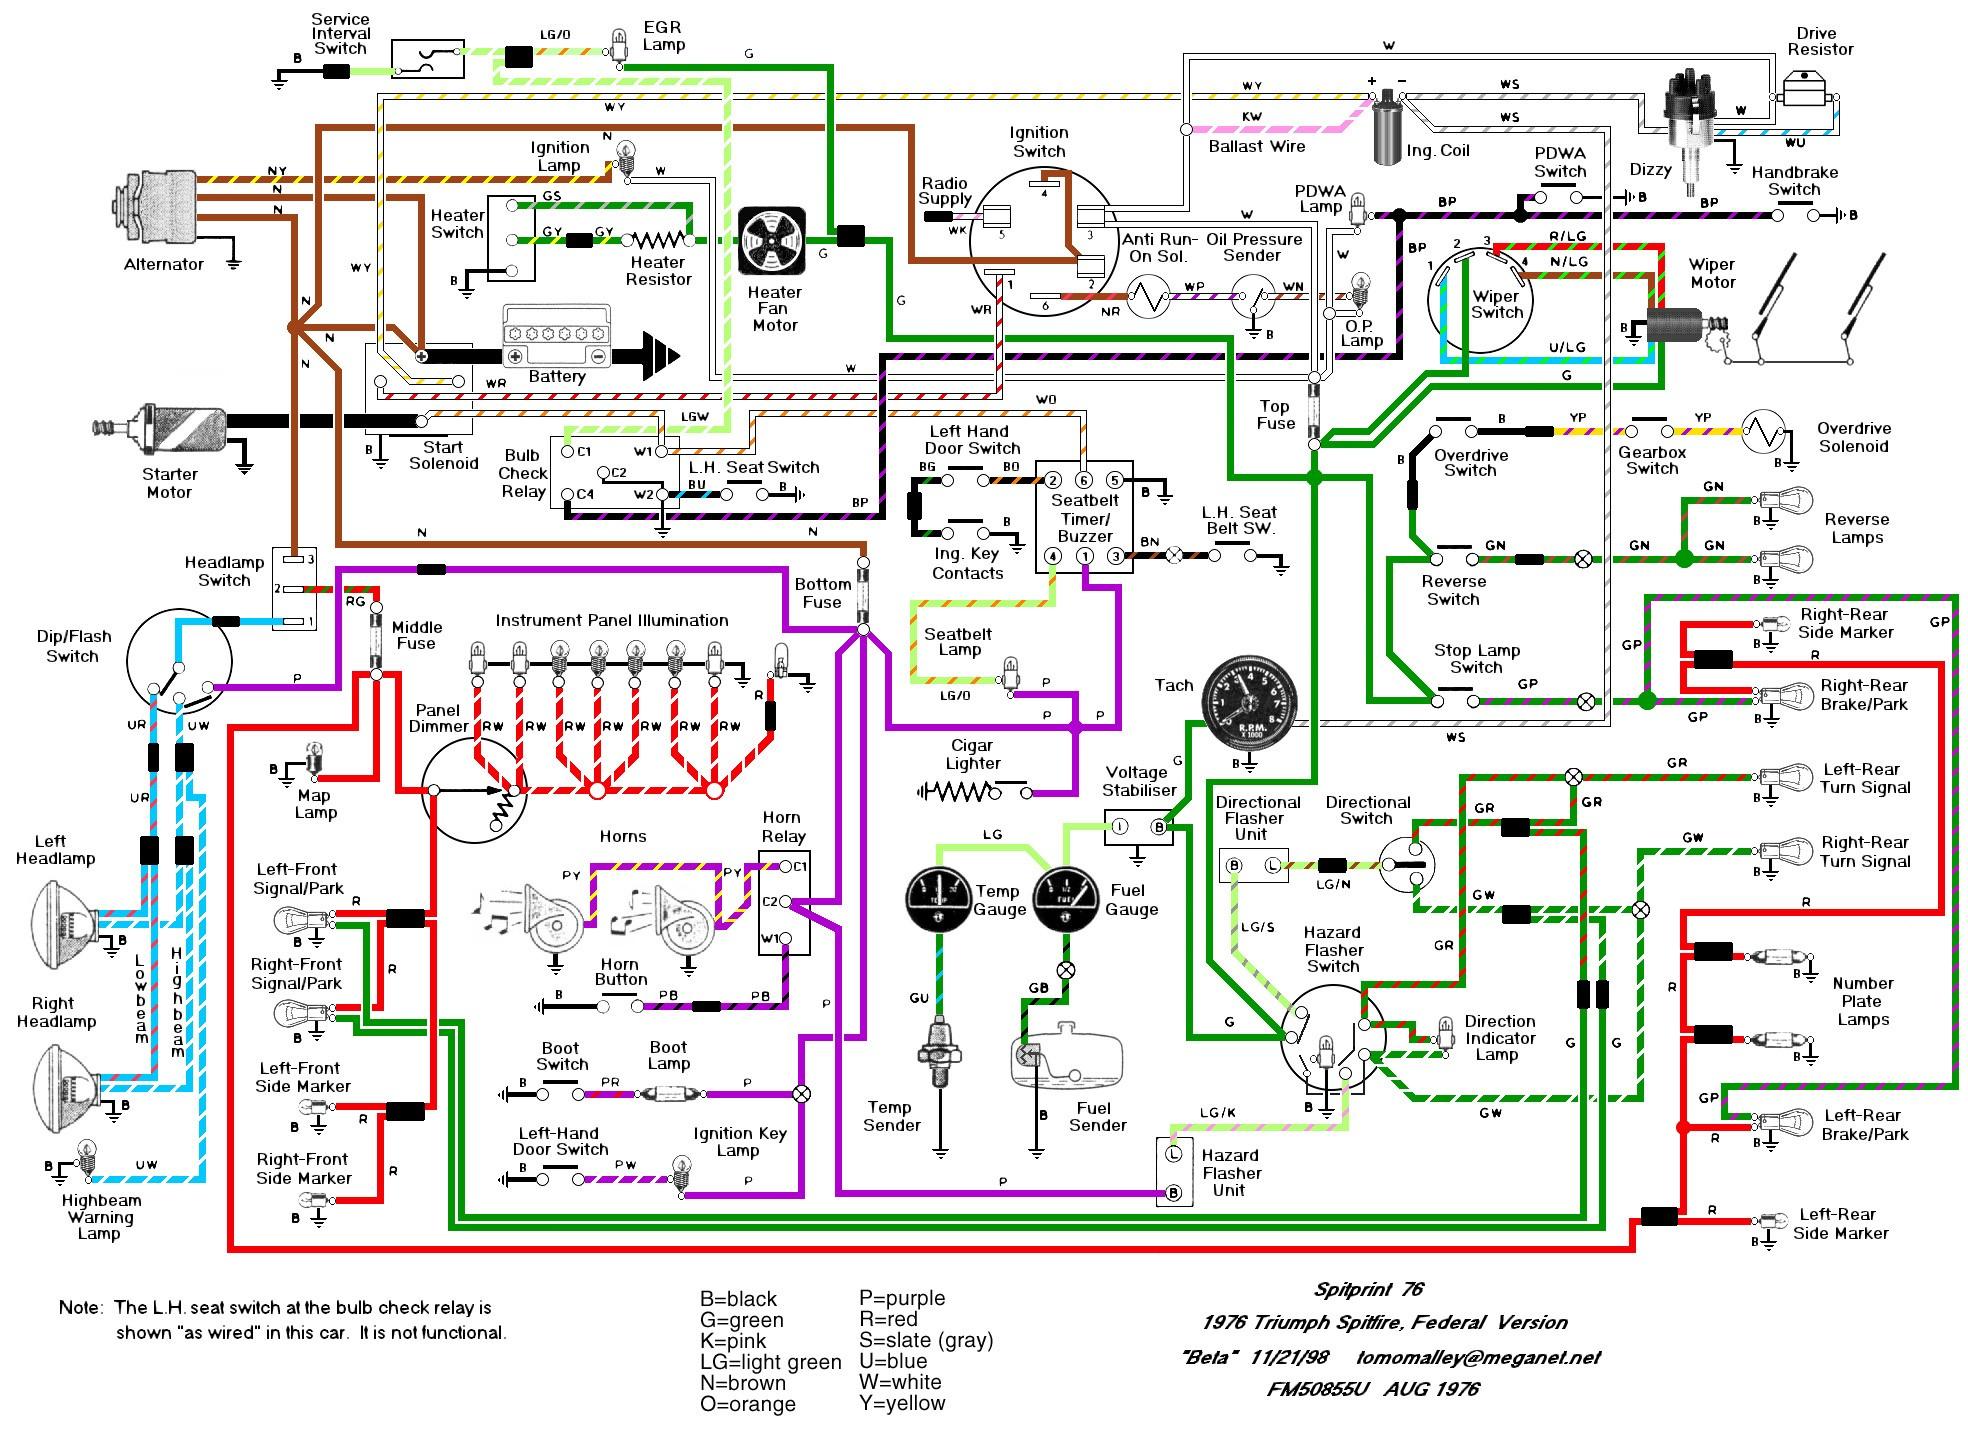 Crane Xr700 Wiring Diagram Crane Xr700 Wiring Diagram Wiring Diagram Of Crane Xr700 Wiring Diagram